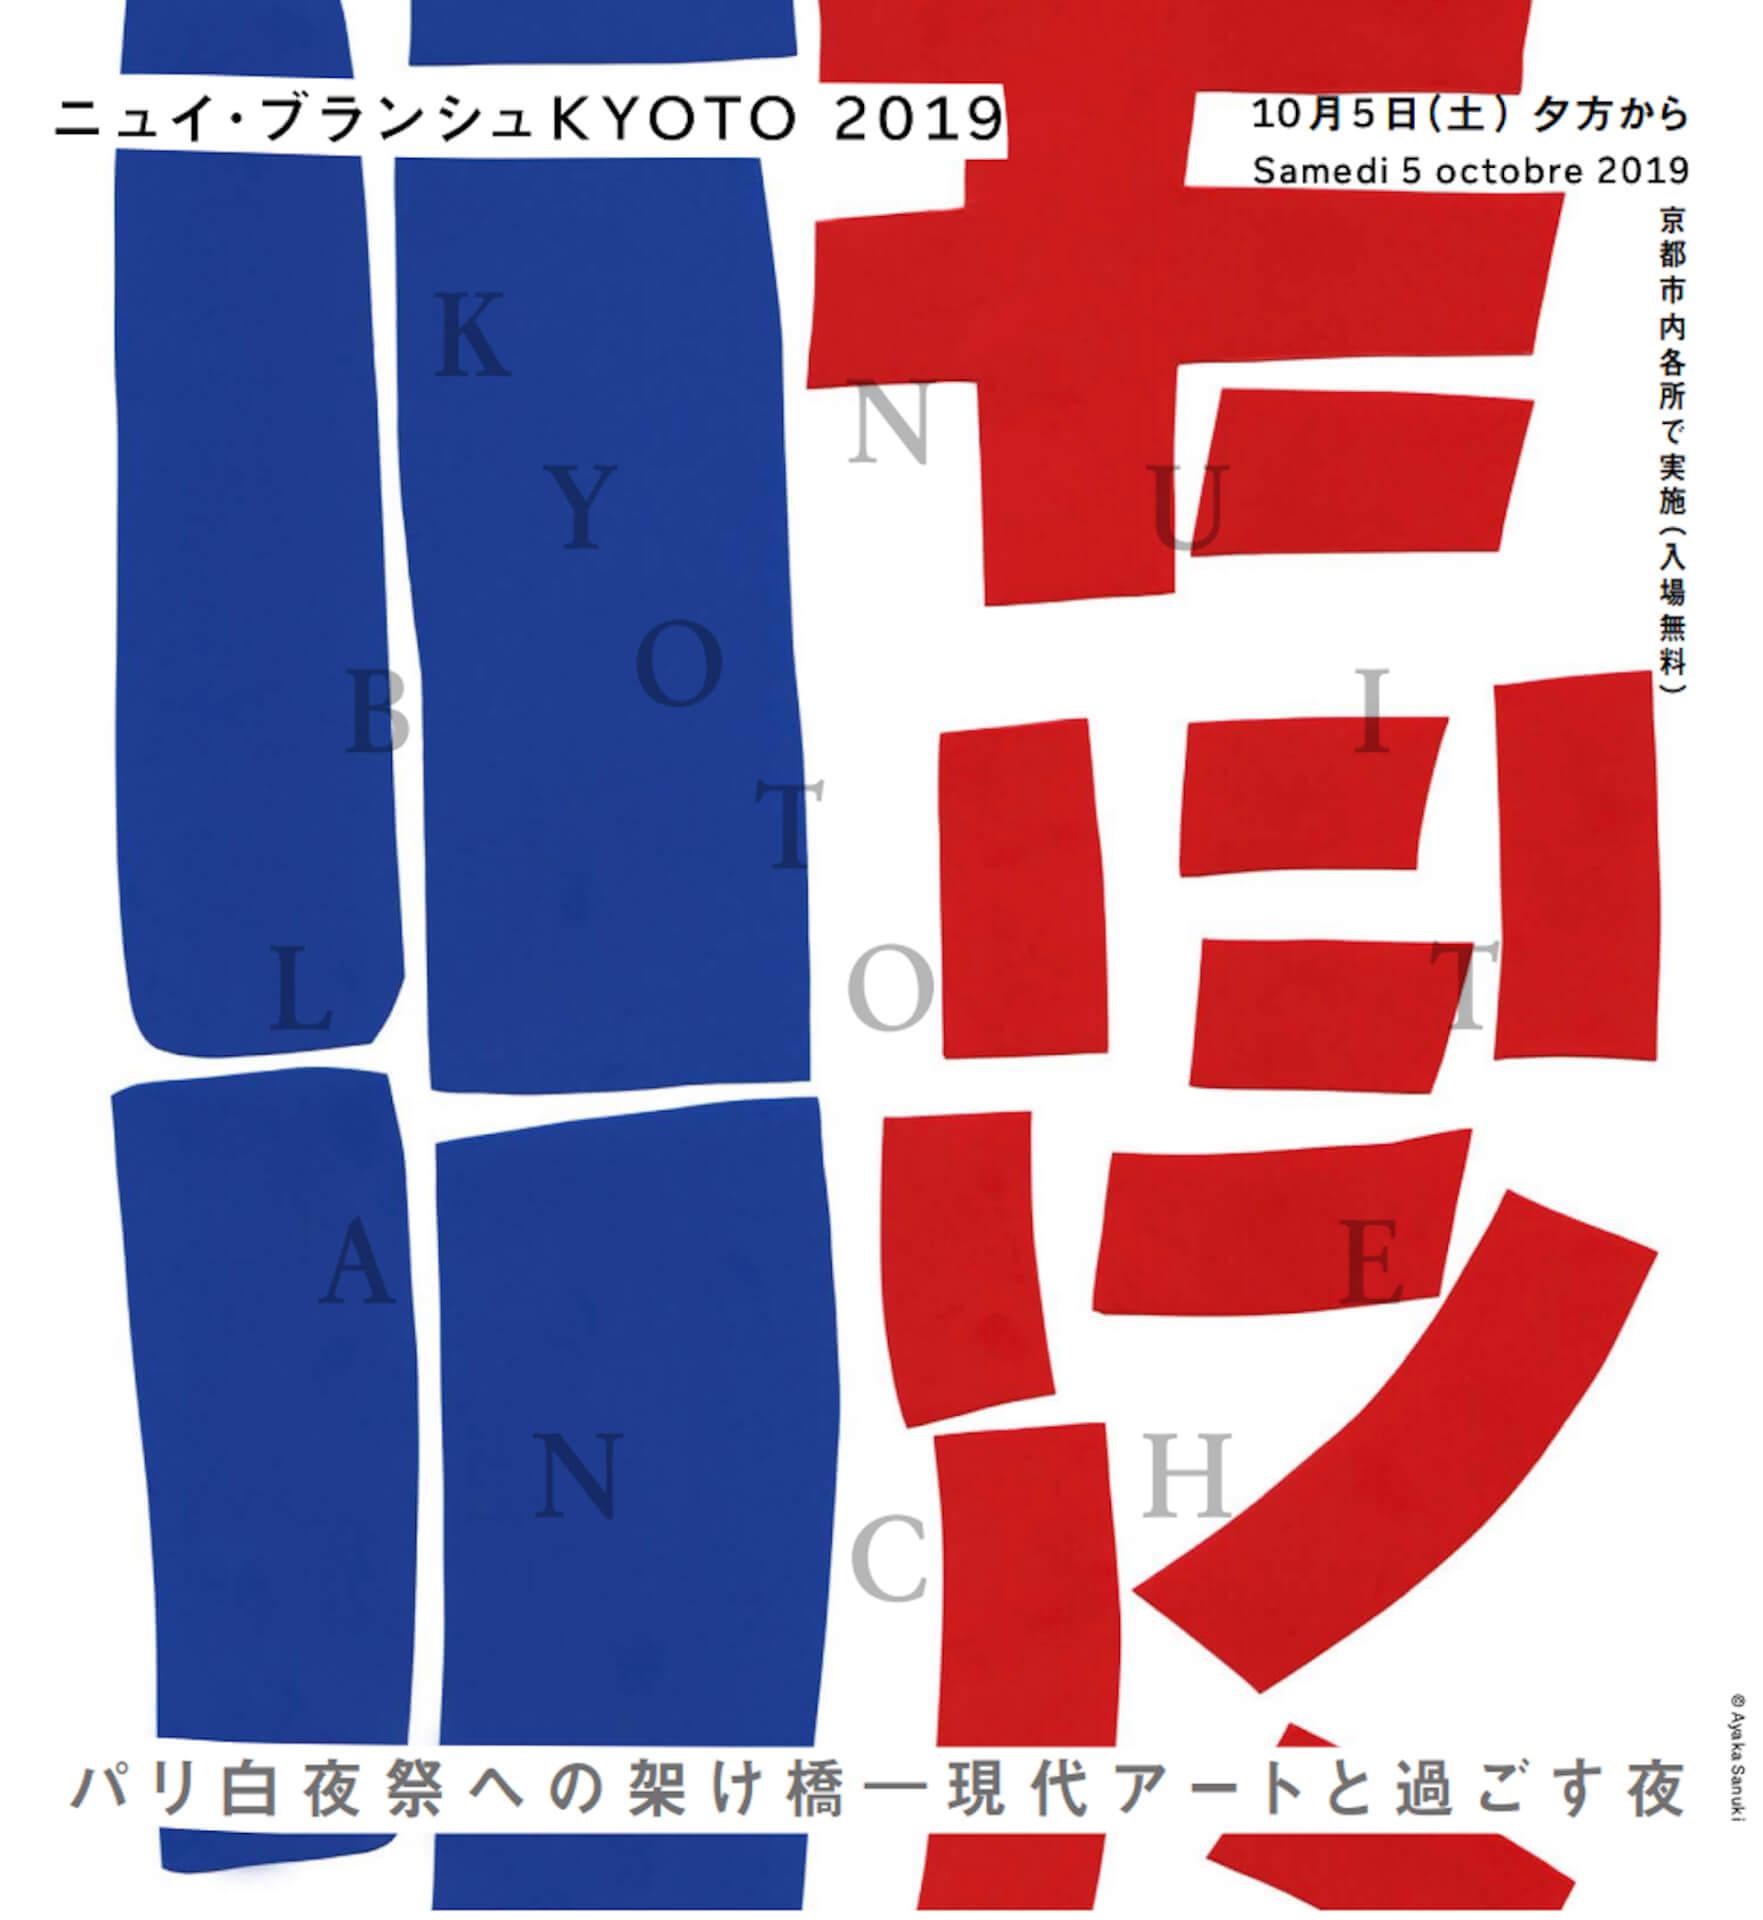 Seiho、<ニュイ・ブランシュKYOTO2019>で〈靉靆〉展示作品『霖雨-Indulge in Reminiscences-』発表決定 art191003_seiho_rinu_1